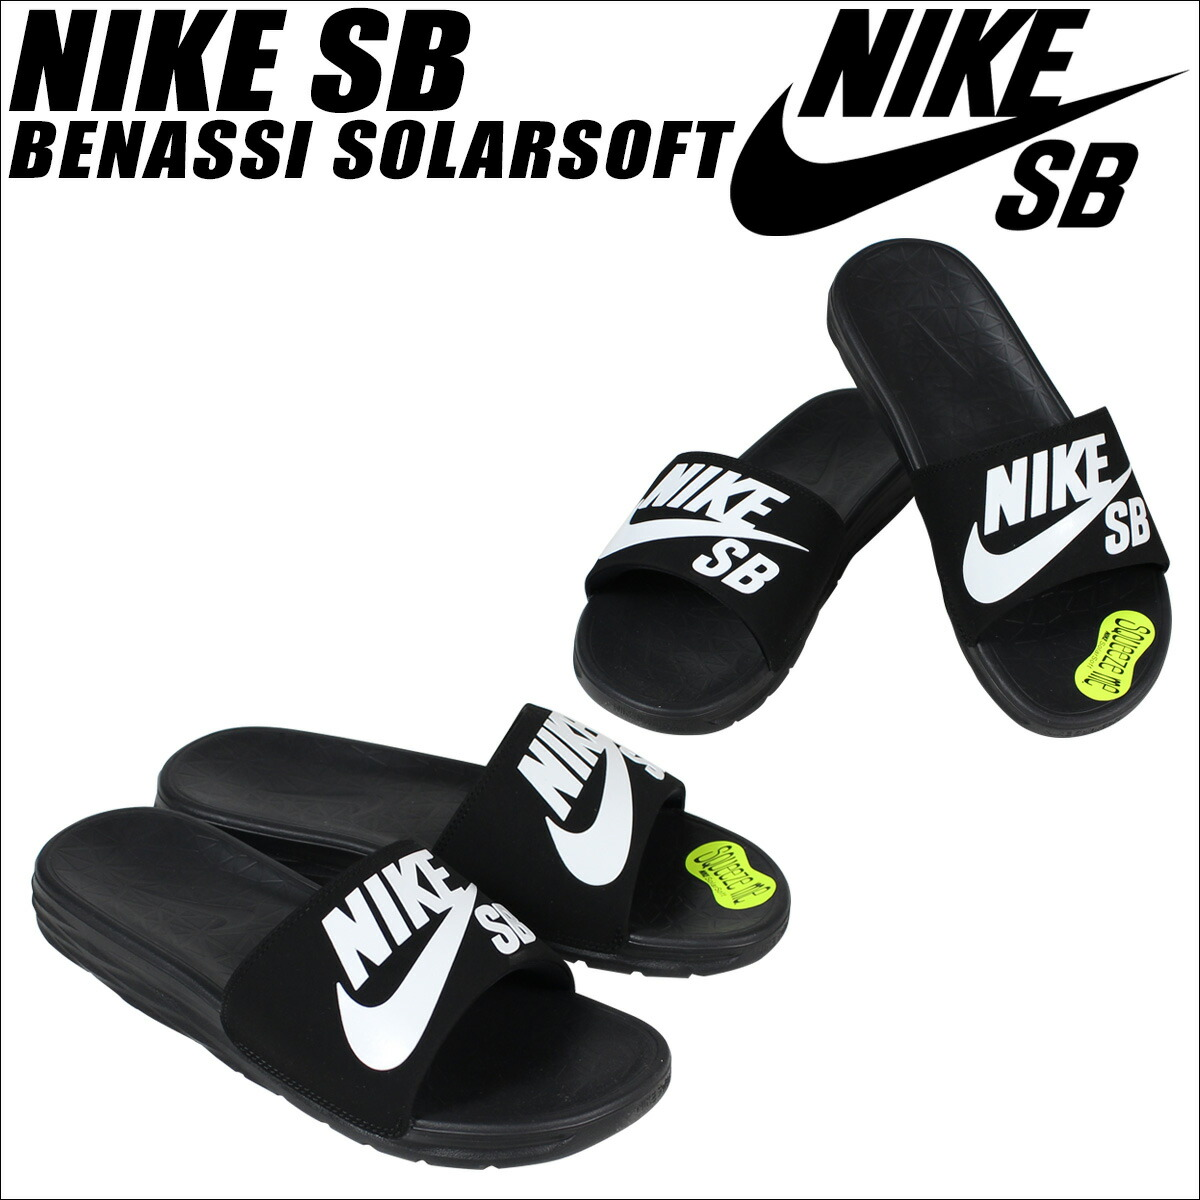 nike sb online 012b802563da